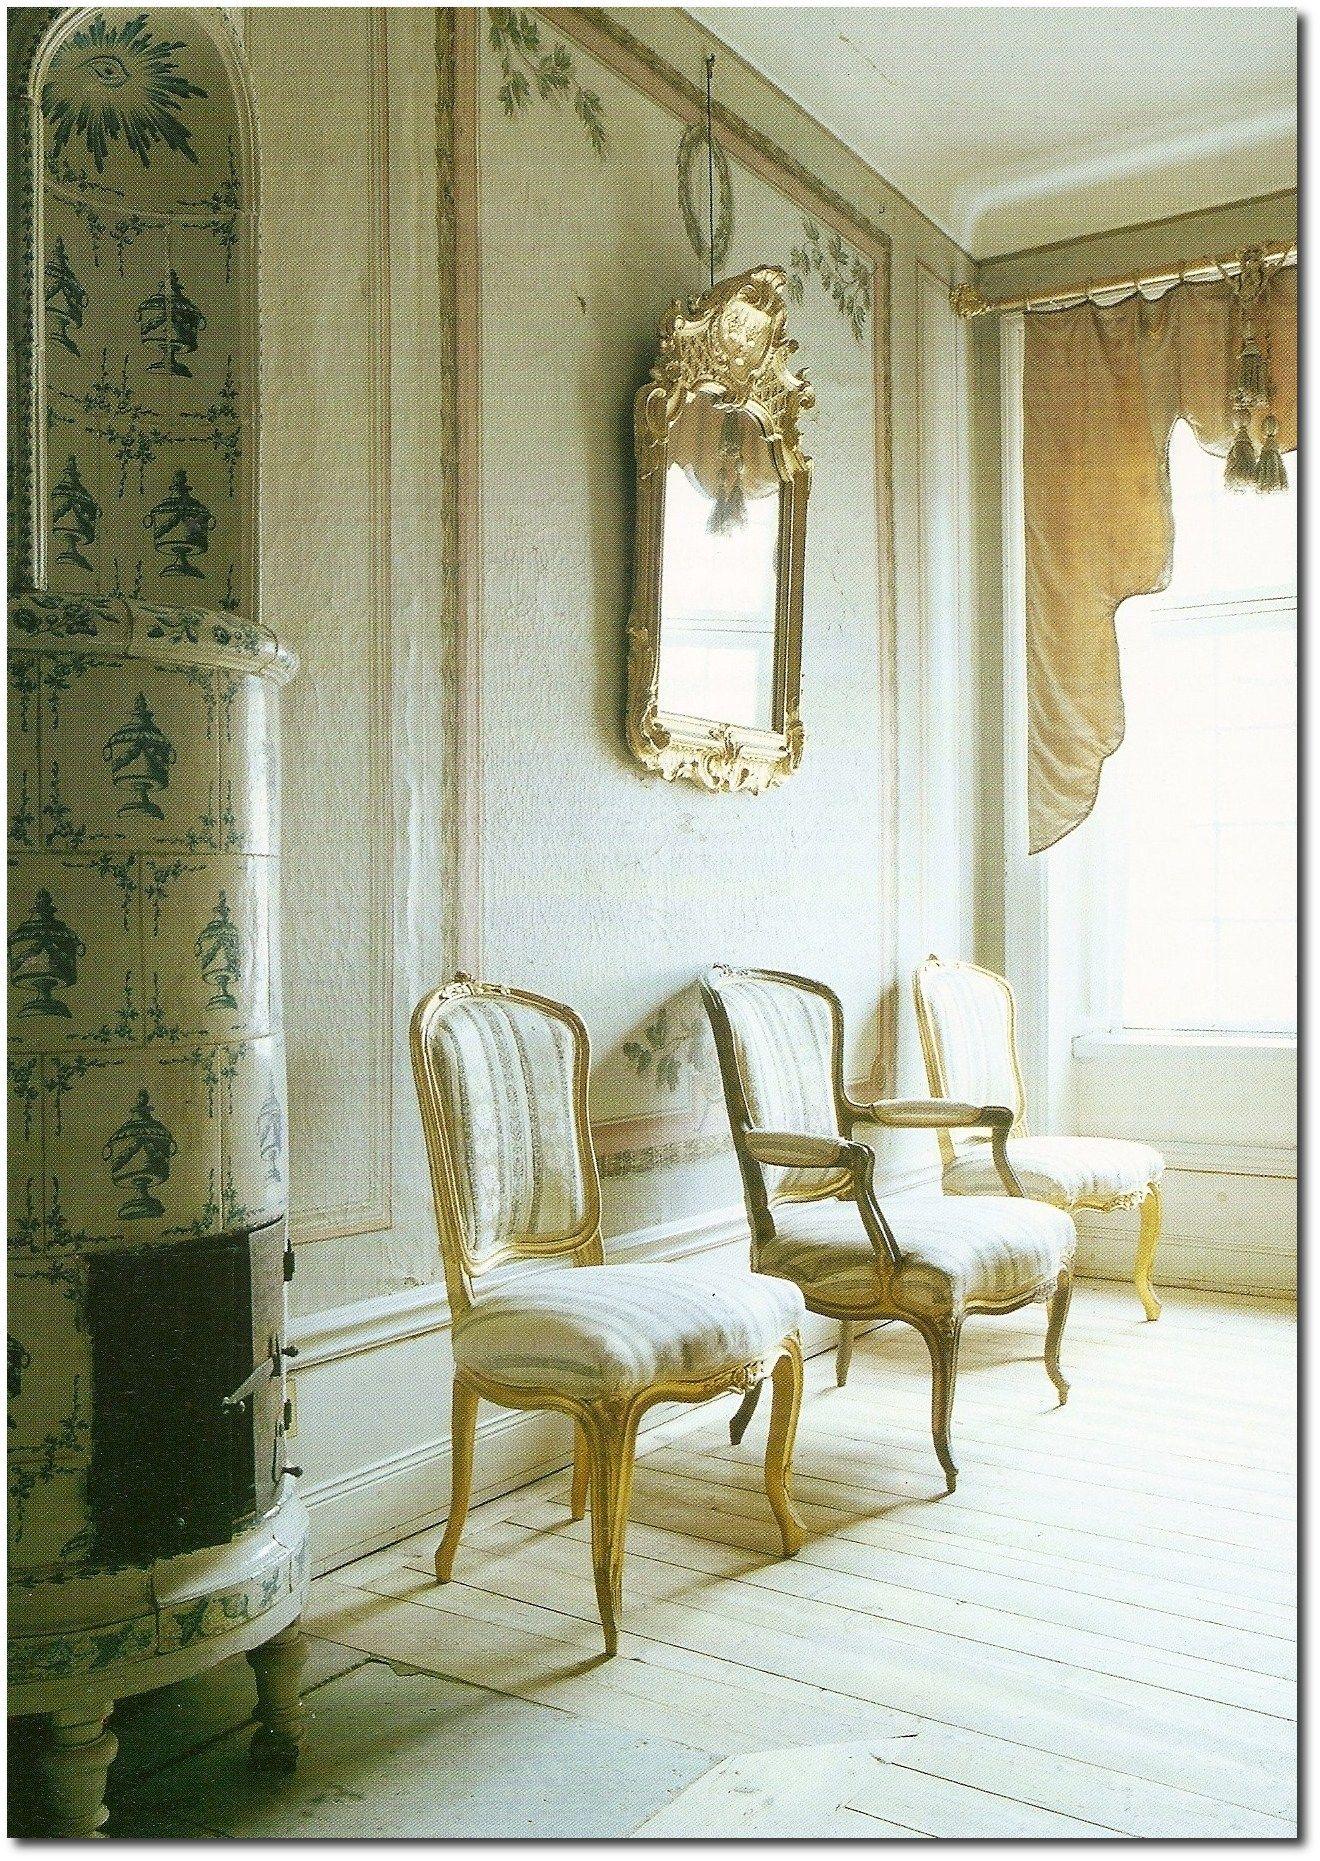 Book Review Jocasta Innes Scandinavian Painted Furniture Scandinavian Style Furniture Gustavian Decor Swedish Decor